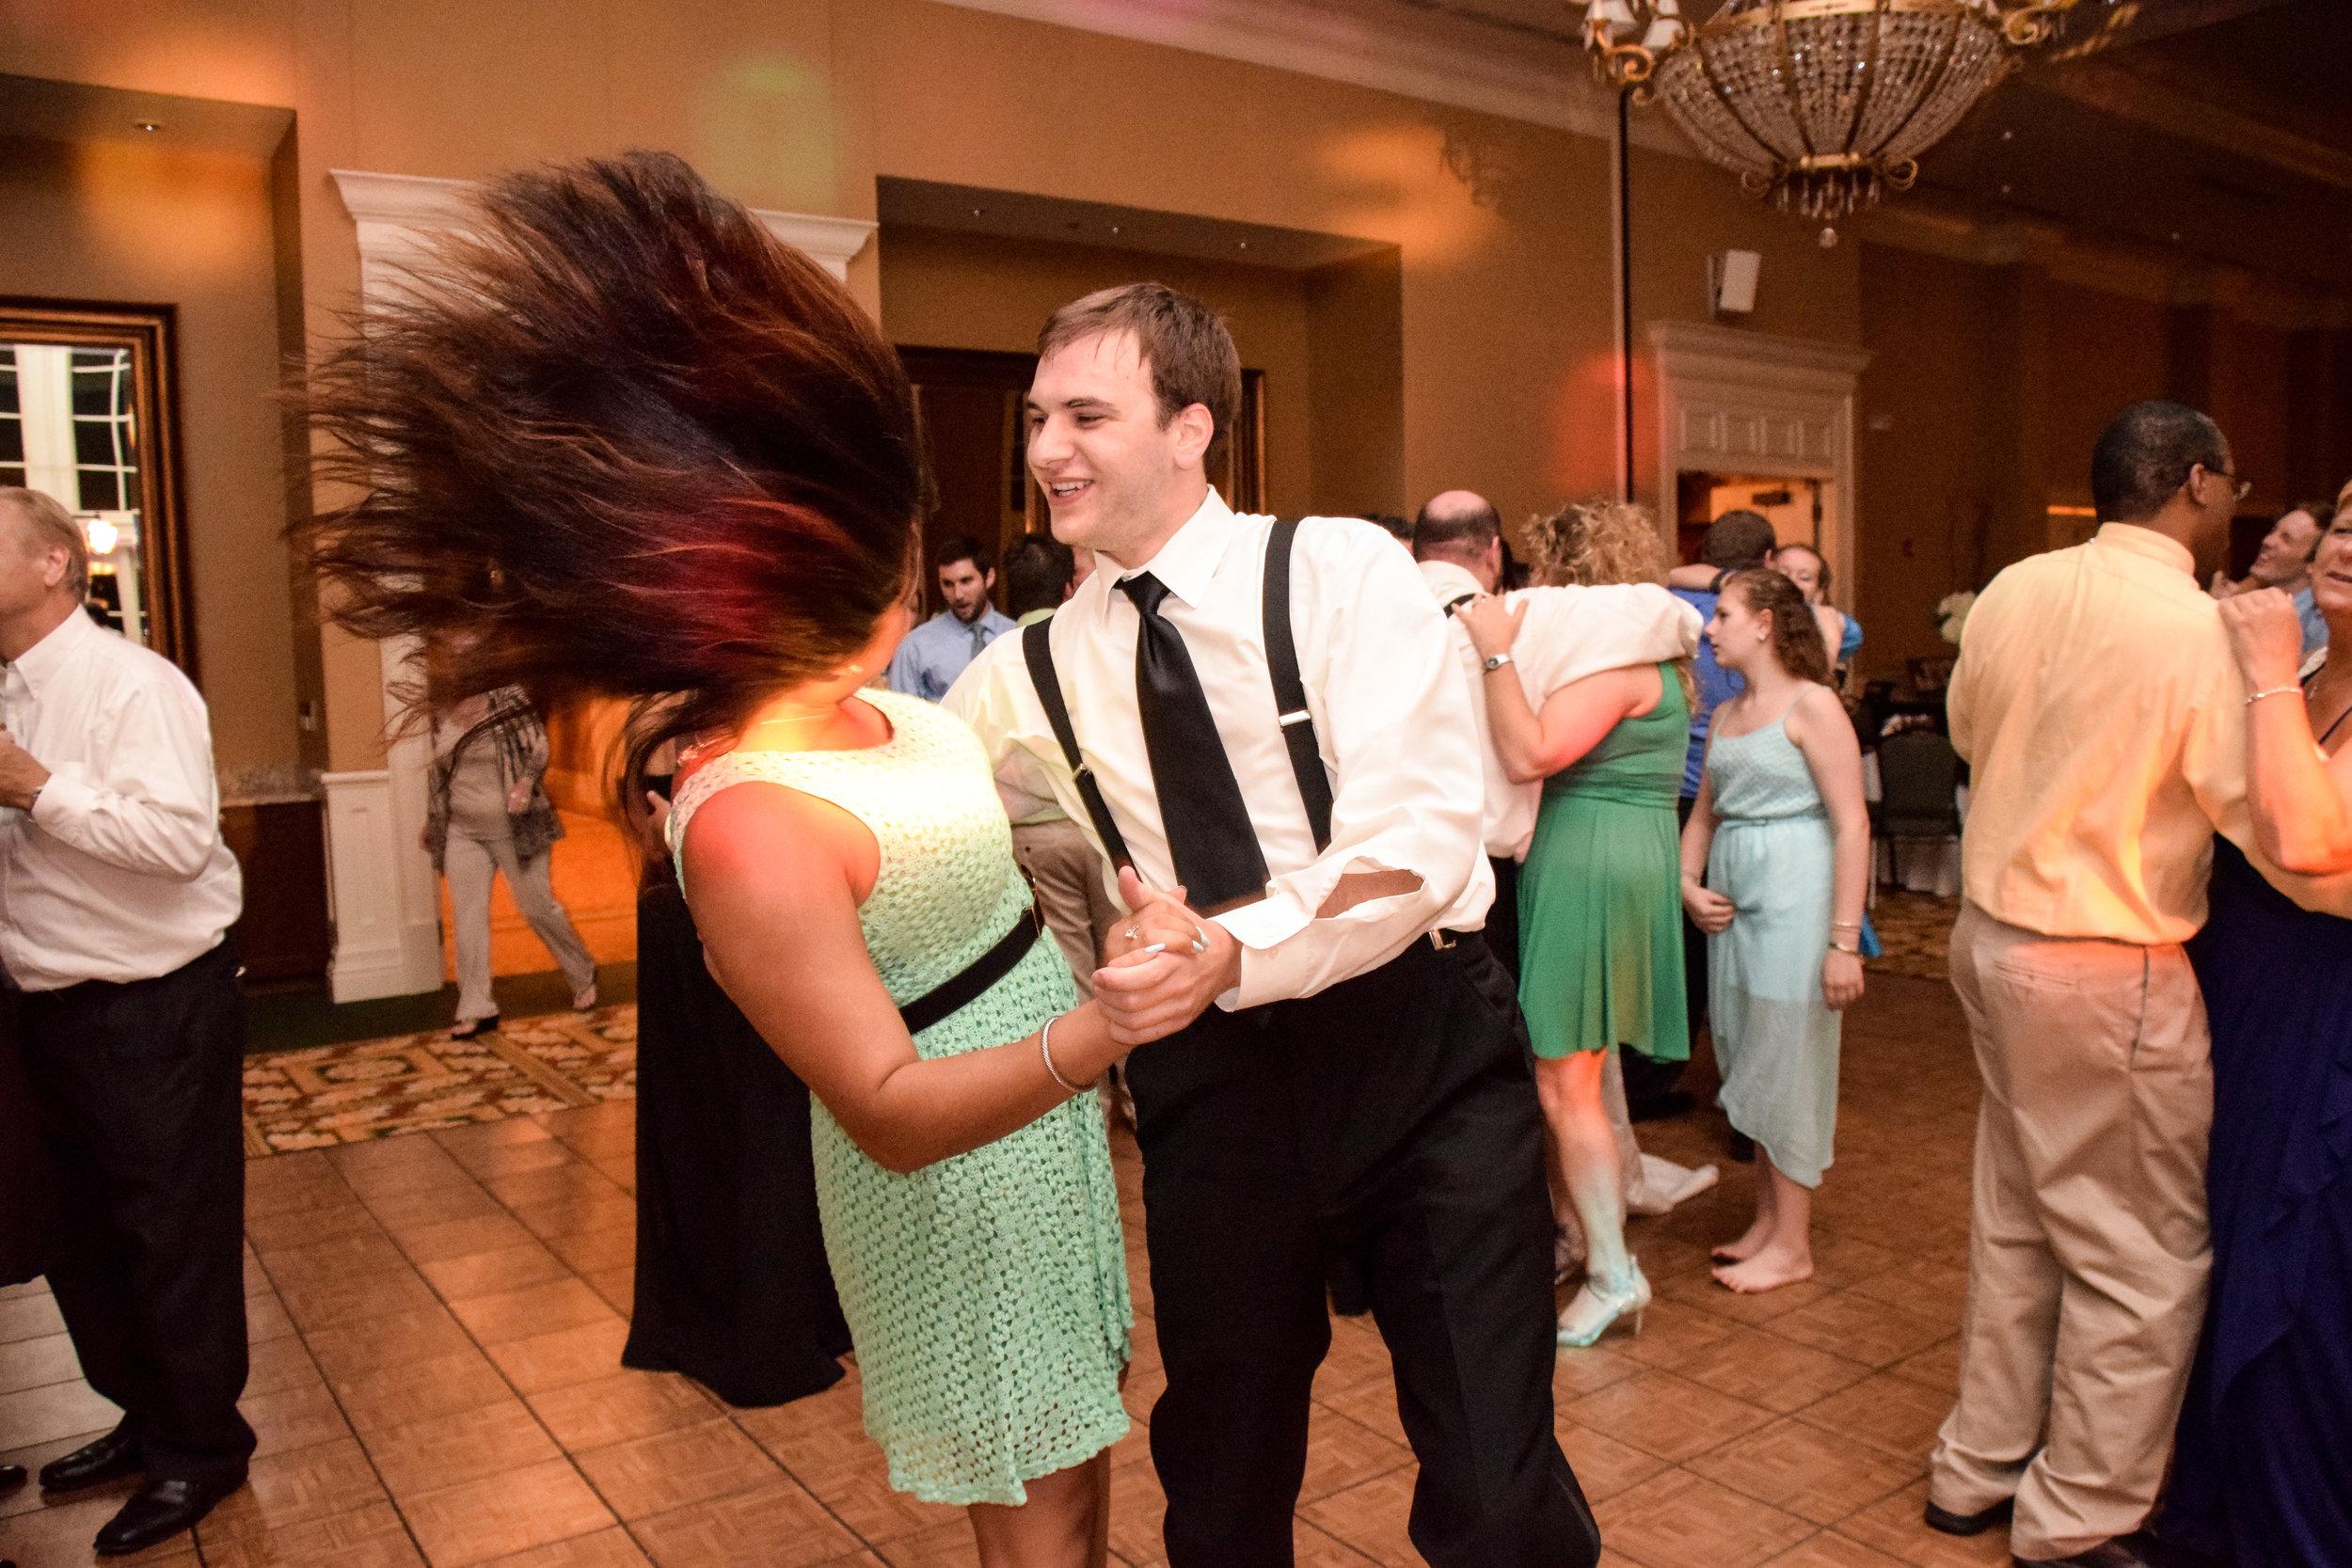 Crazy dance hair.